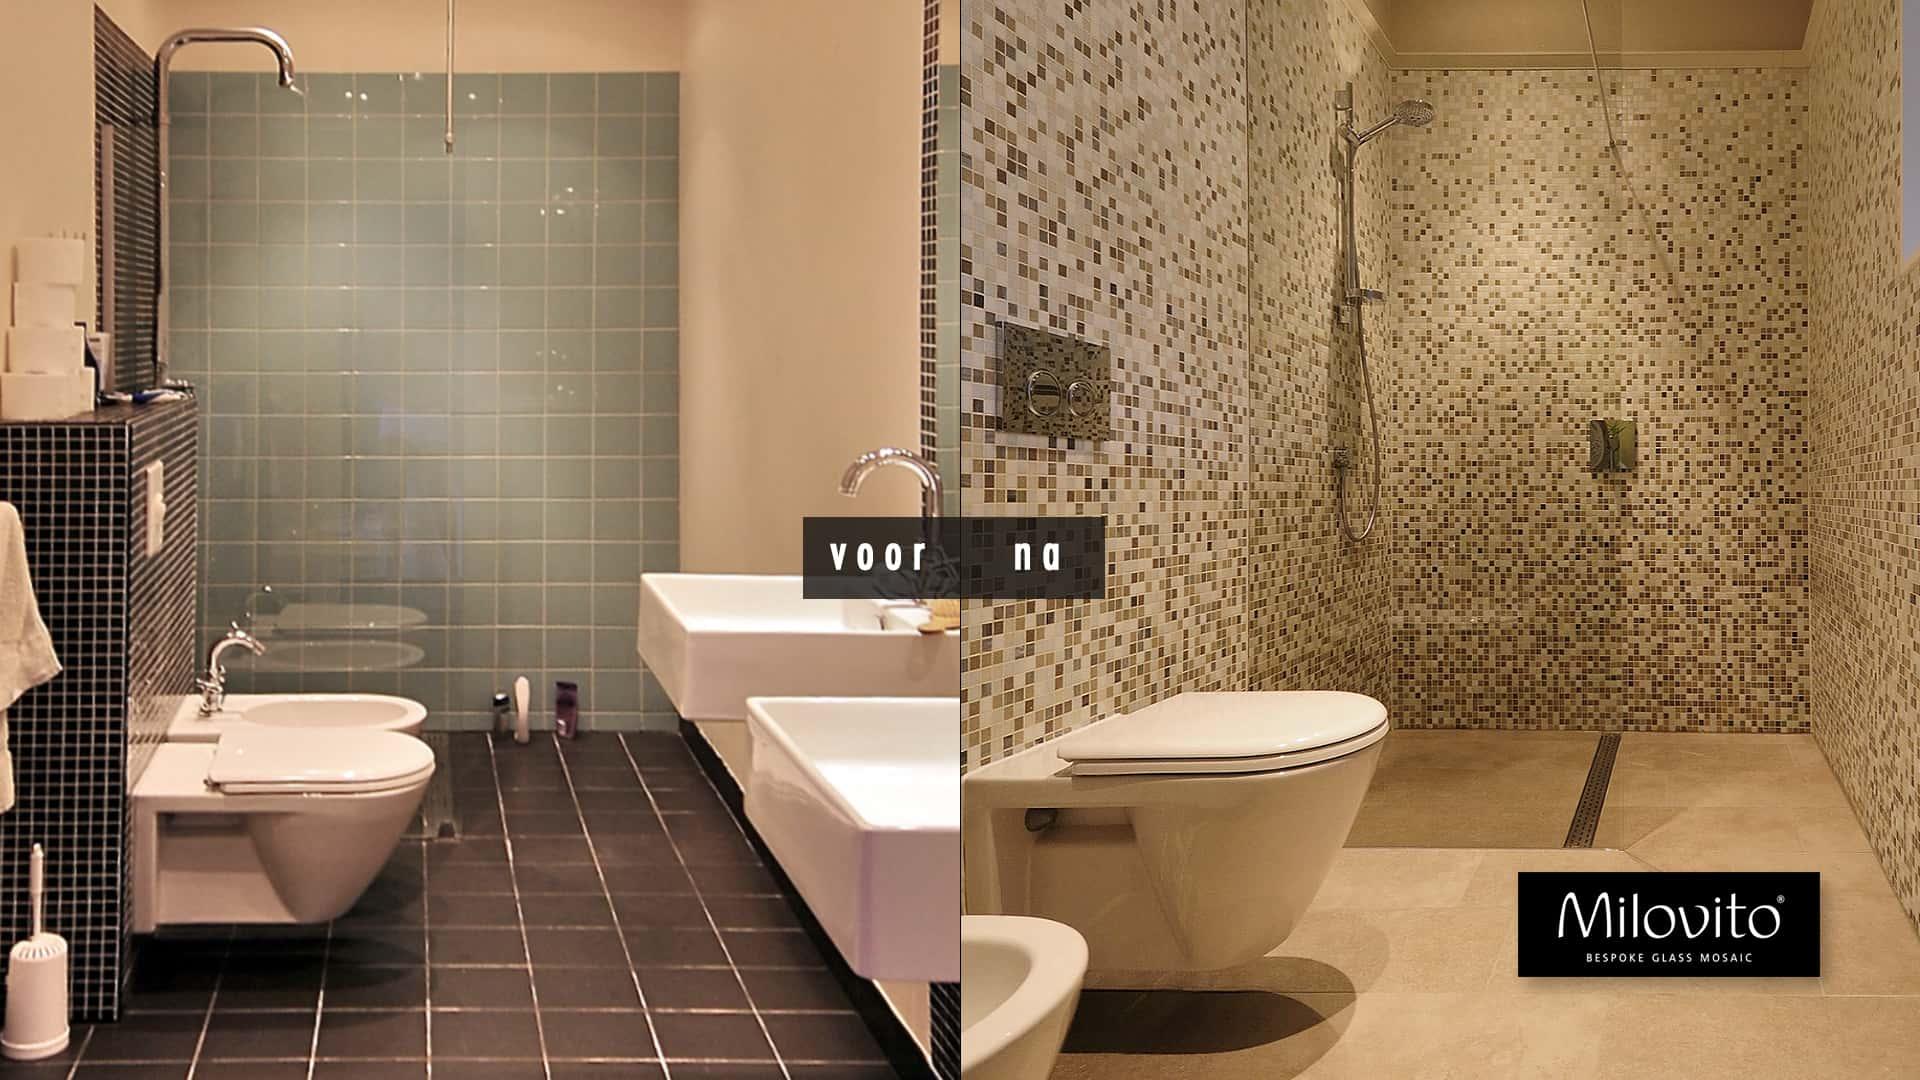 Badkamer Tegels Amsterdam : Spectaculaire badkamer renovatie in amsterdam milovito